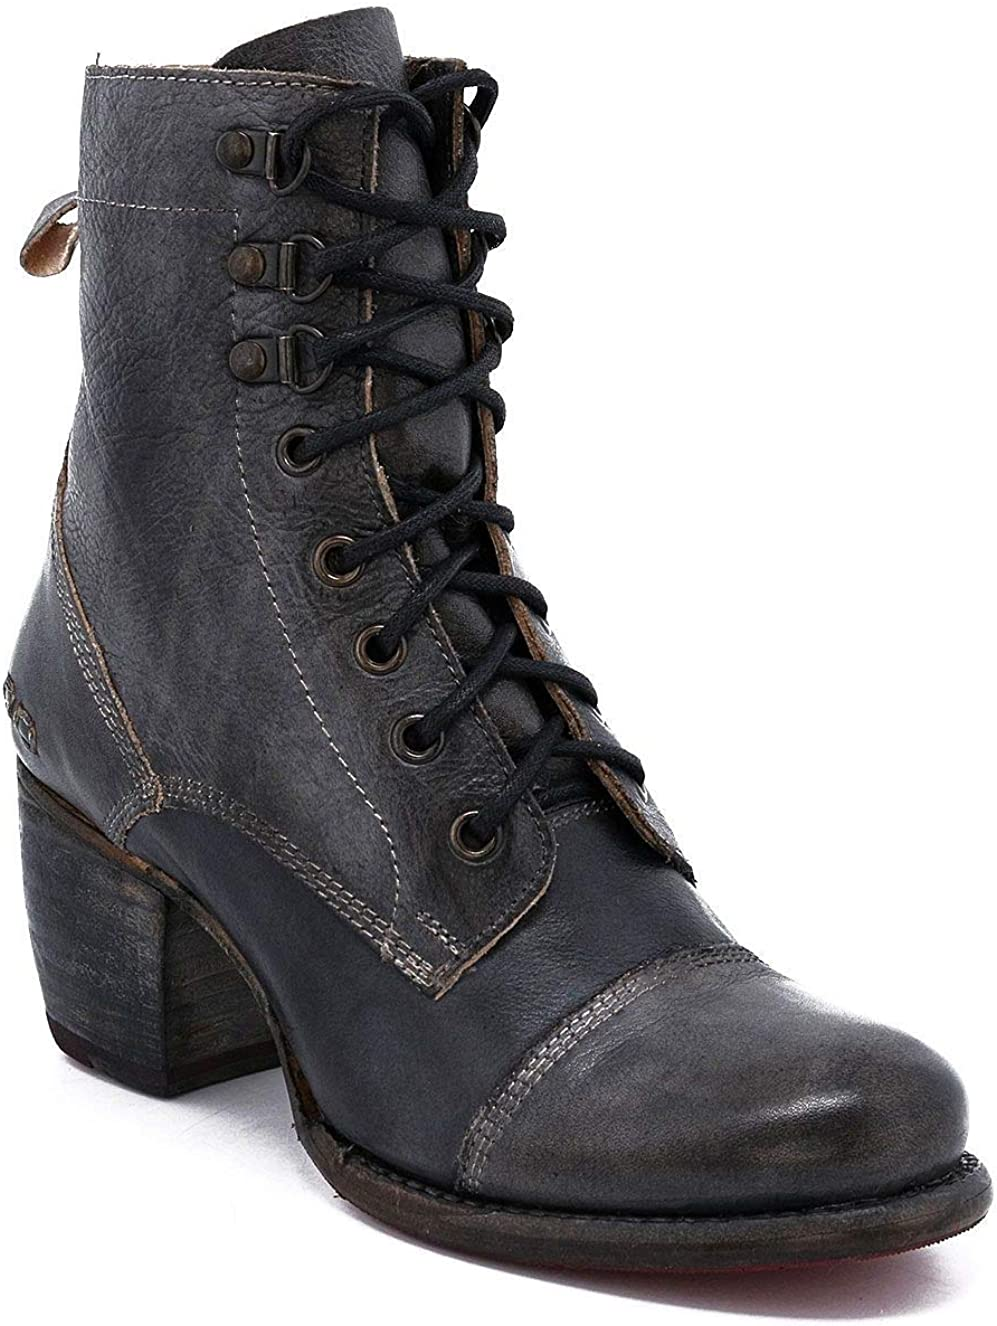 Bed|Stu Women's Judgement Leather Boot